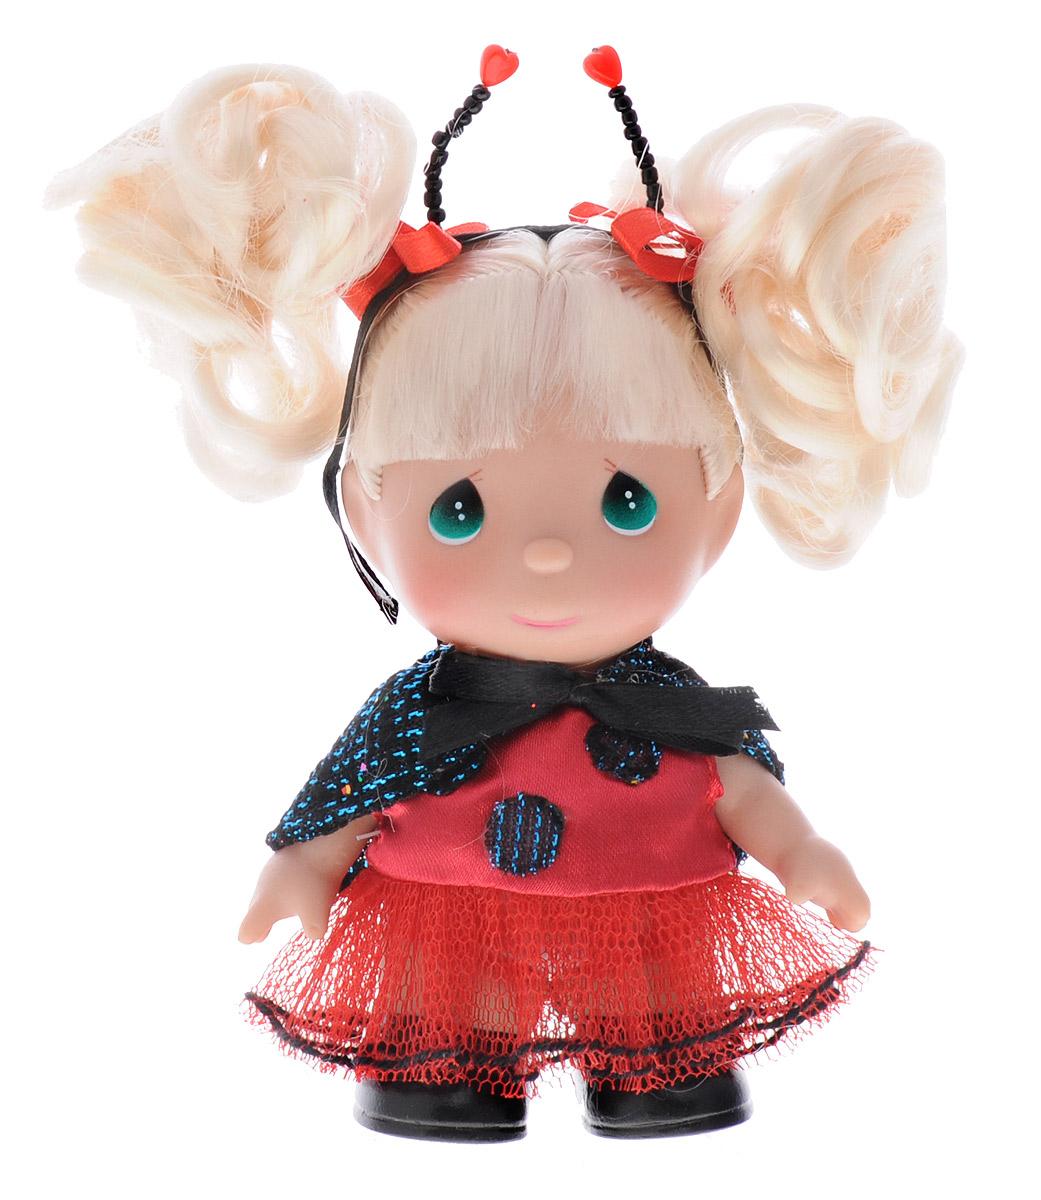 Precious Moments Мини-кукла Божья коровка